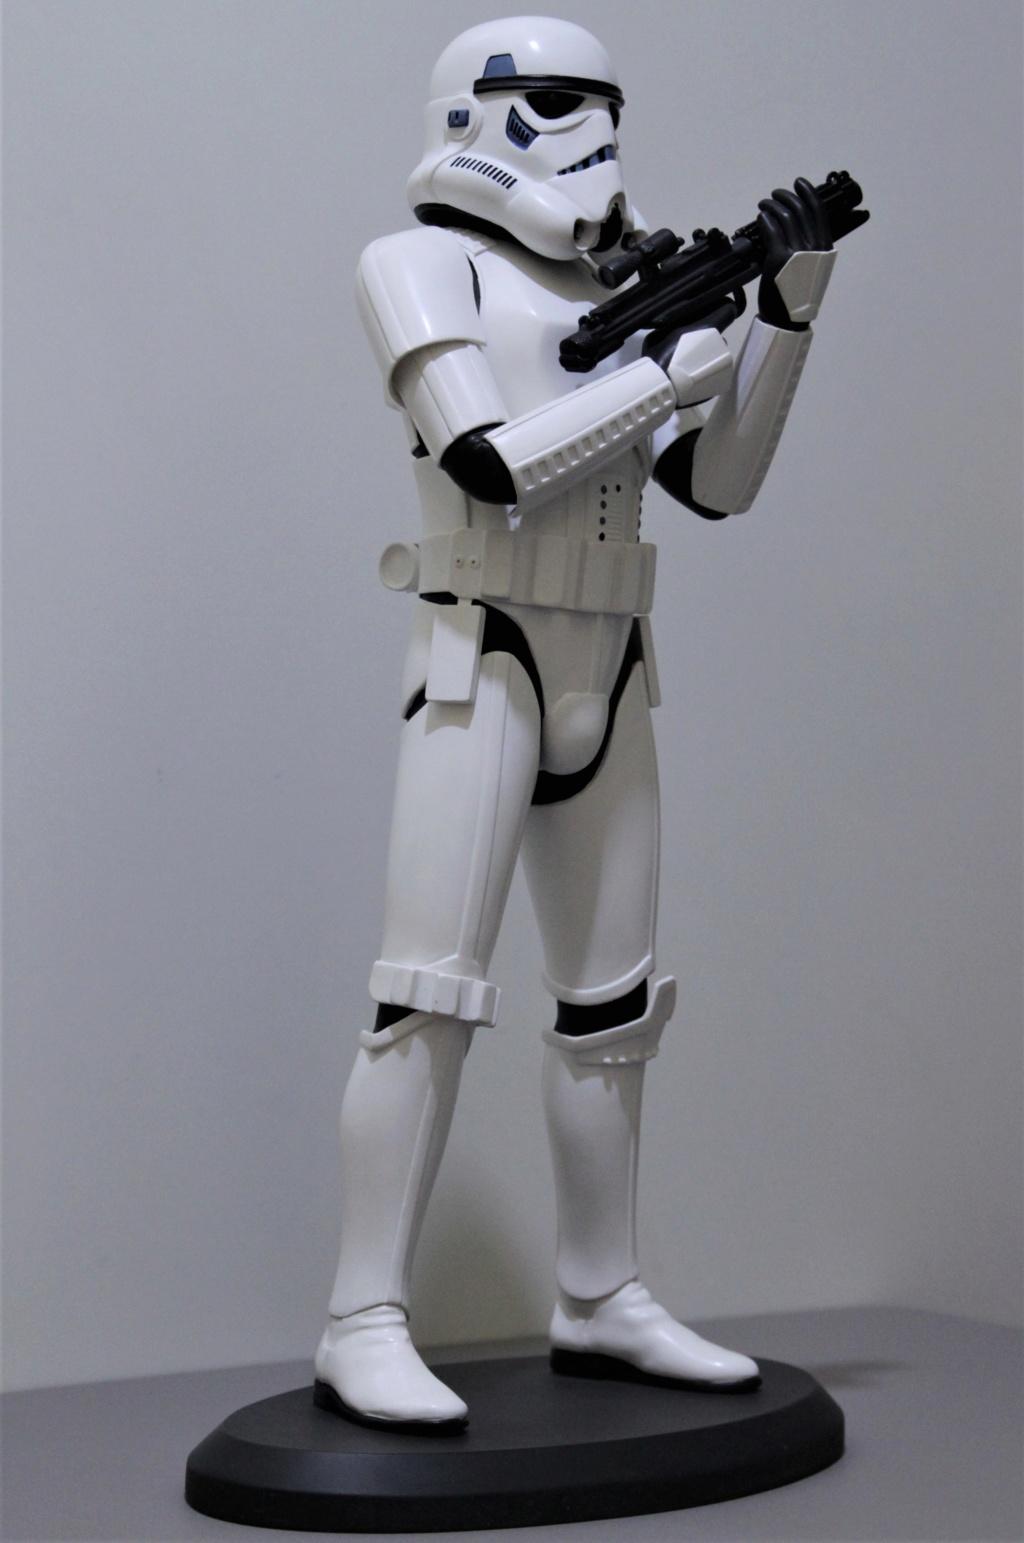 Ventes de Darth Vader ( casque Vader ESB 1:1 ) Img_9221